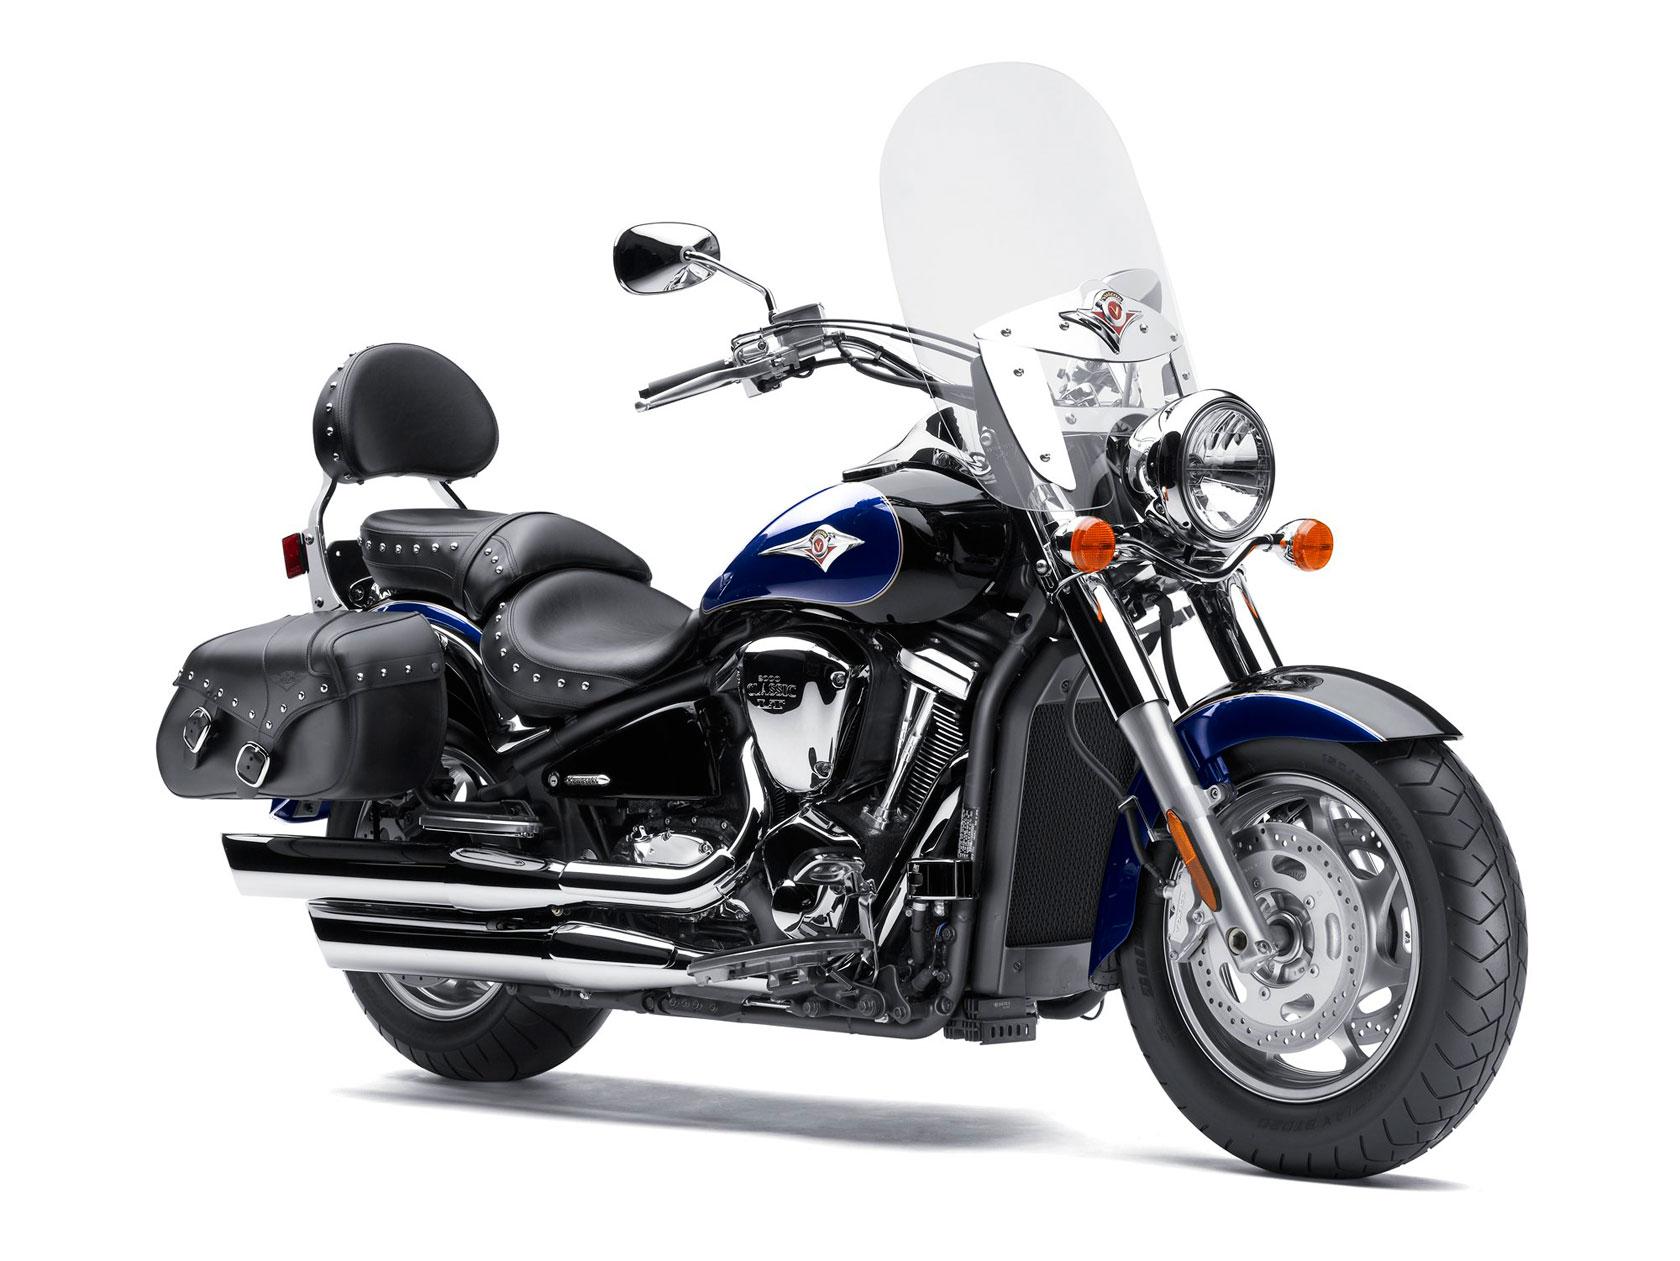 Тест-драйв мотоцикла Kawasaki VN2000 Vulcan